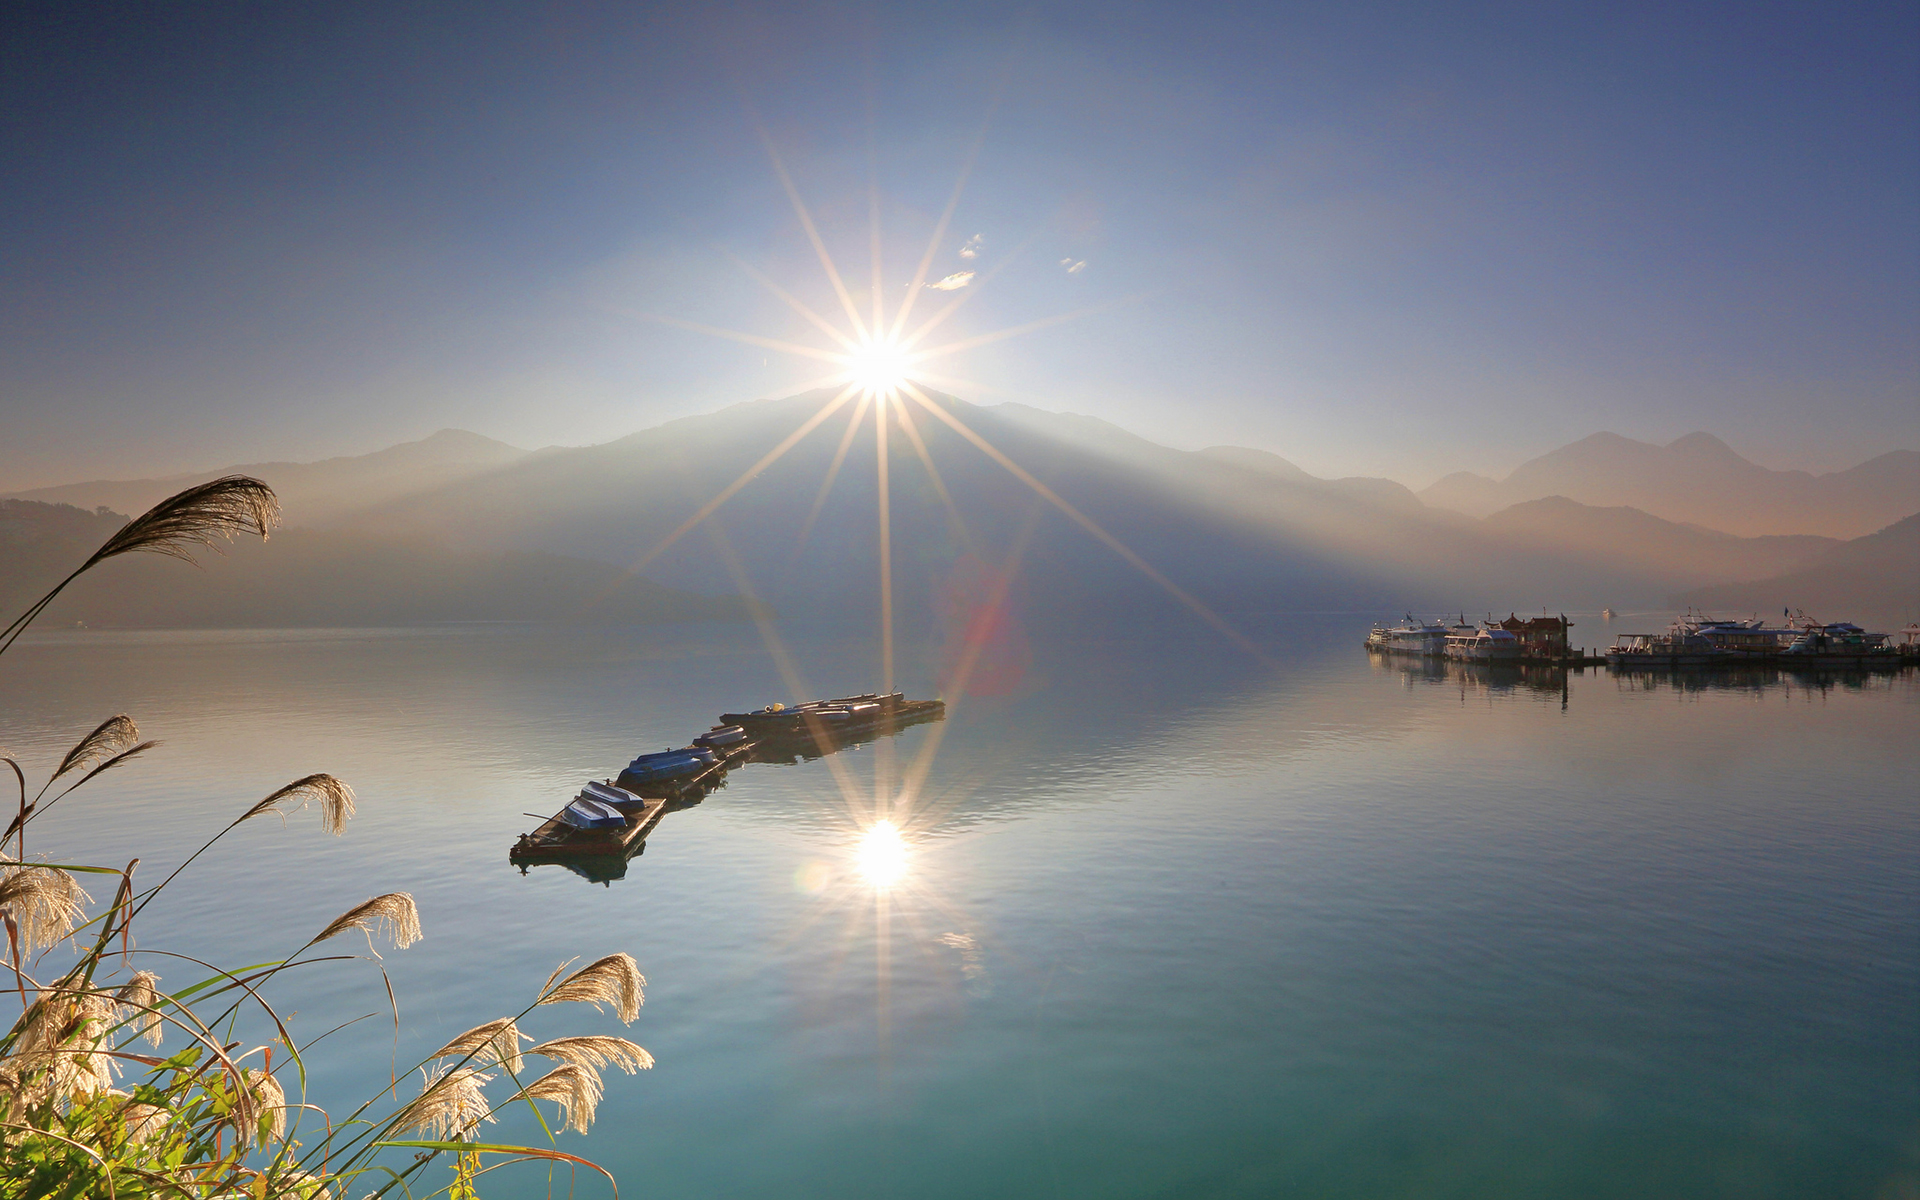 display wallpaper images,sky,nature,sun,natural landscape,morning